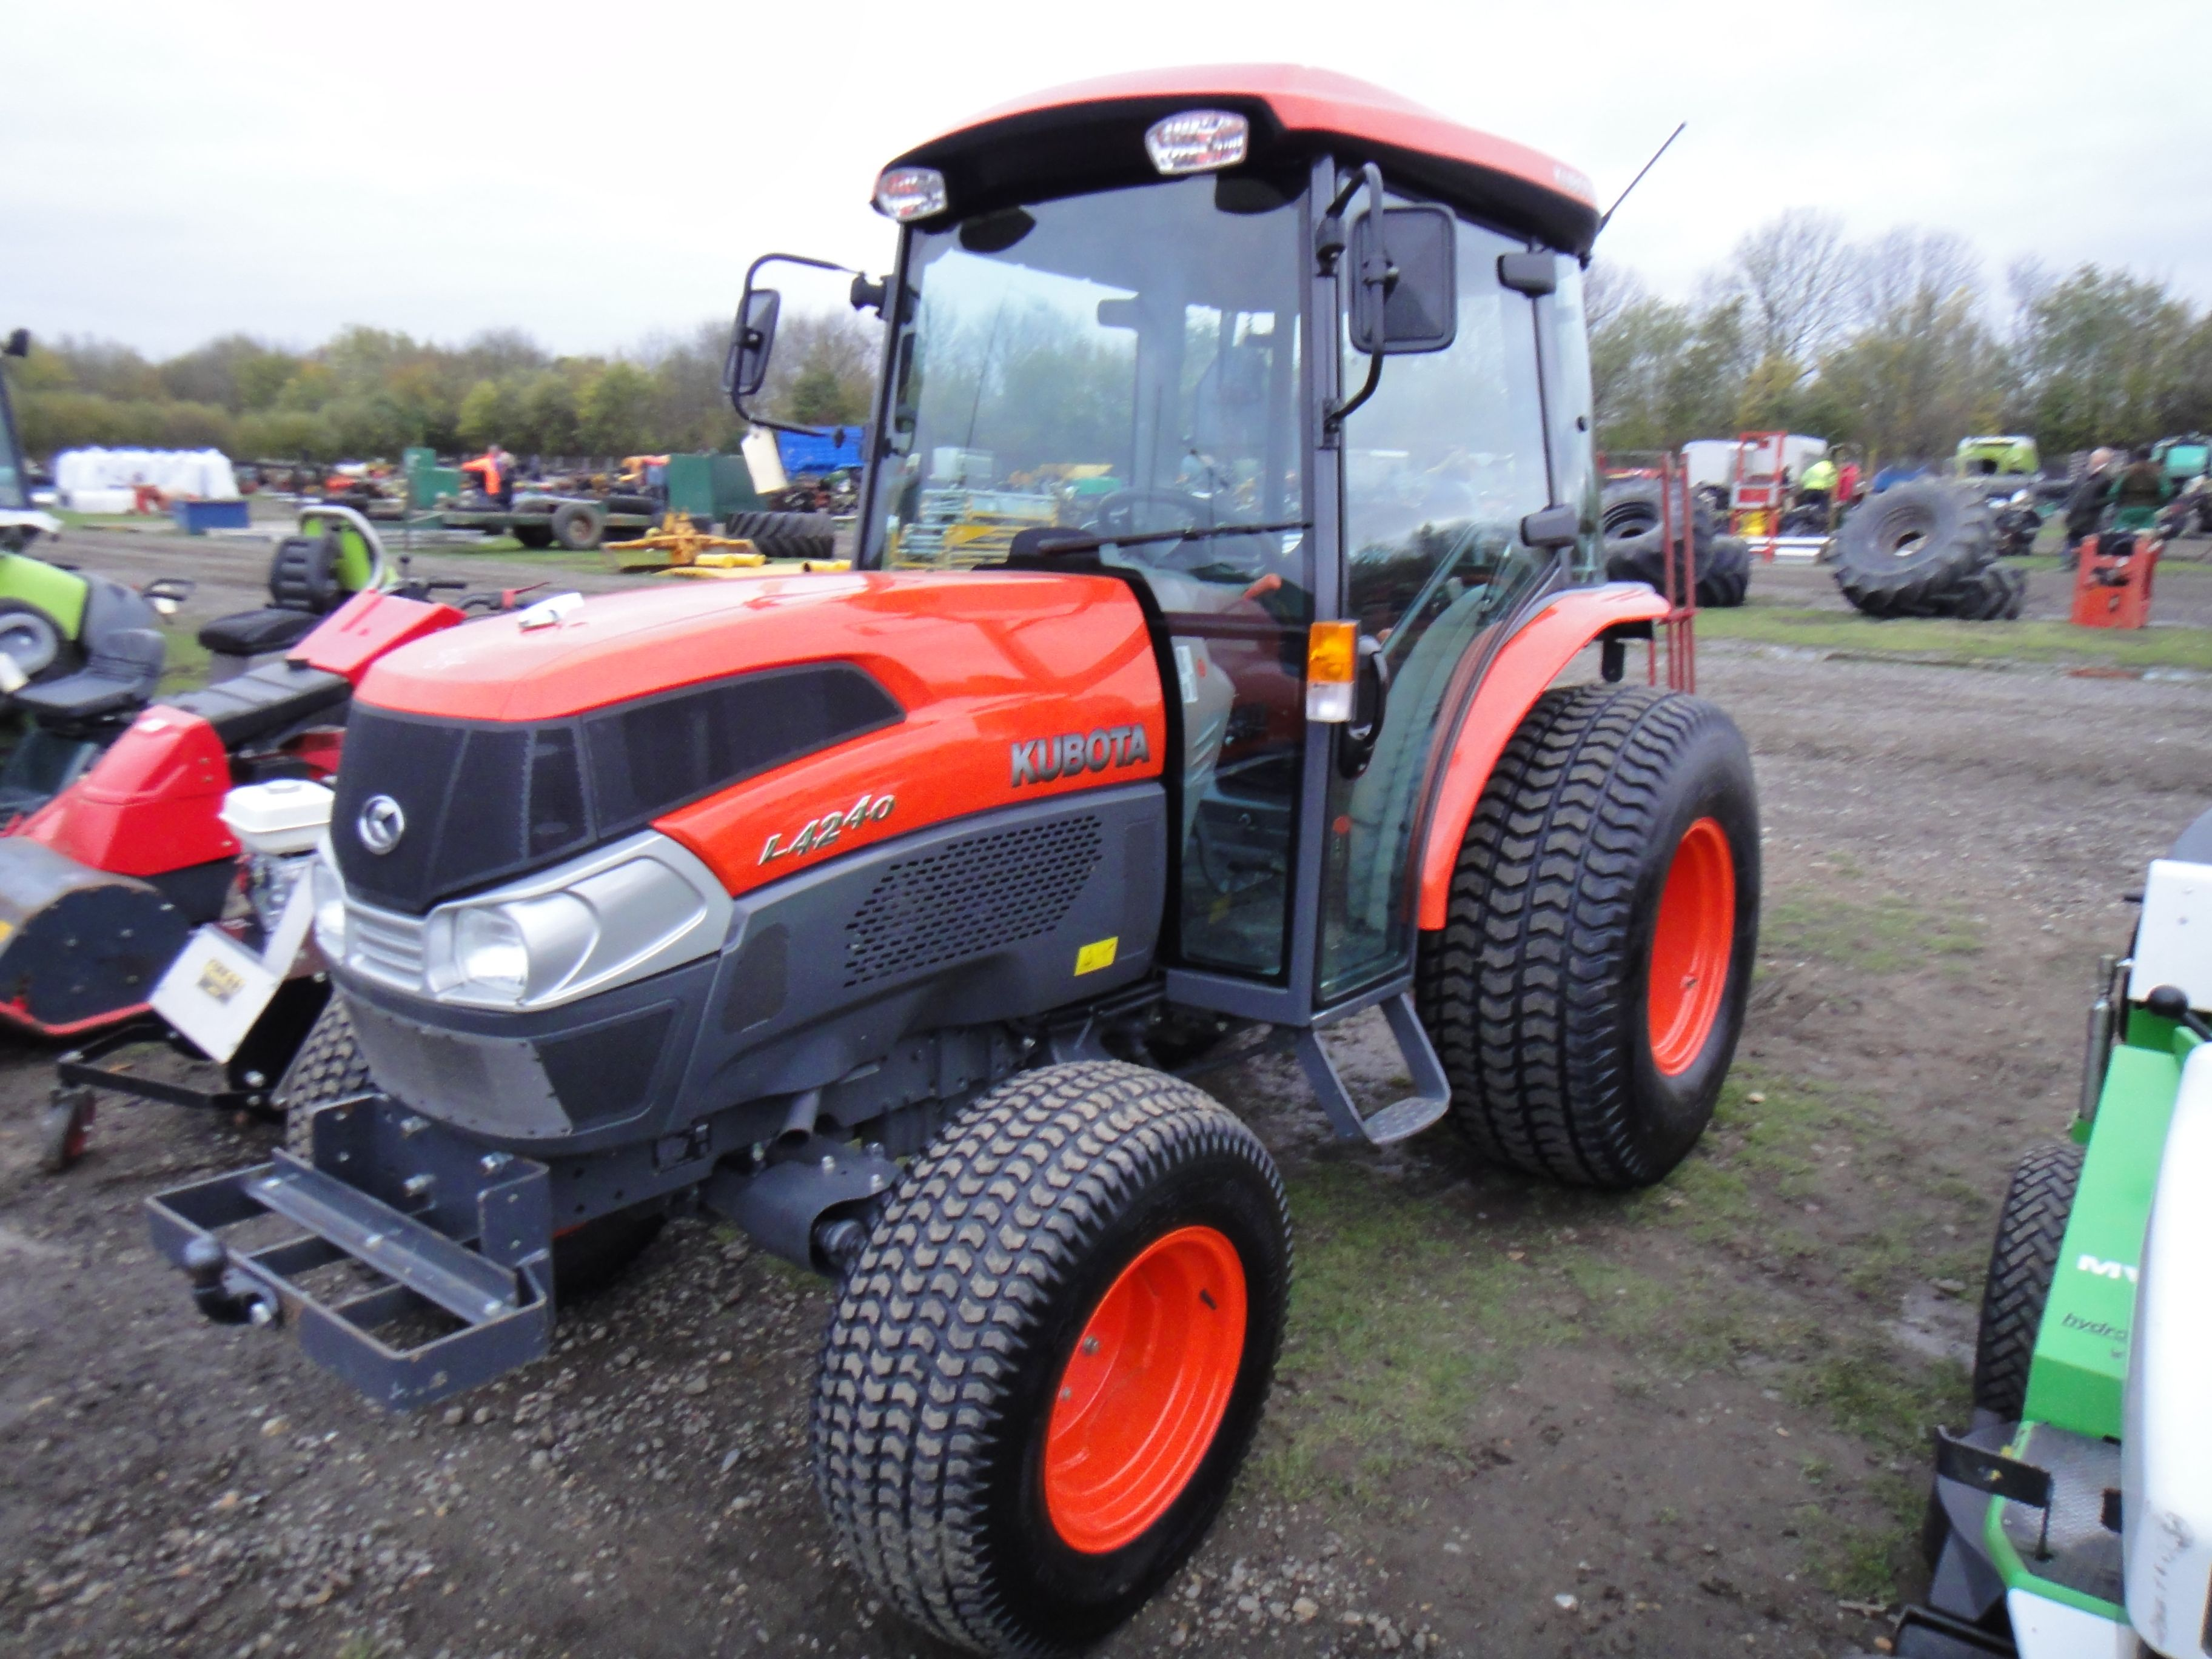 Best 25 kubota tractor parts ideas on pinterest used kubota kubota kubota tractorsmanualfarming sciox Images